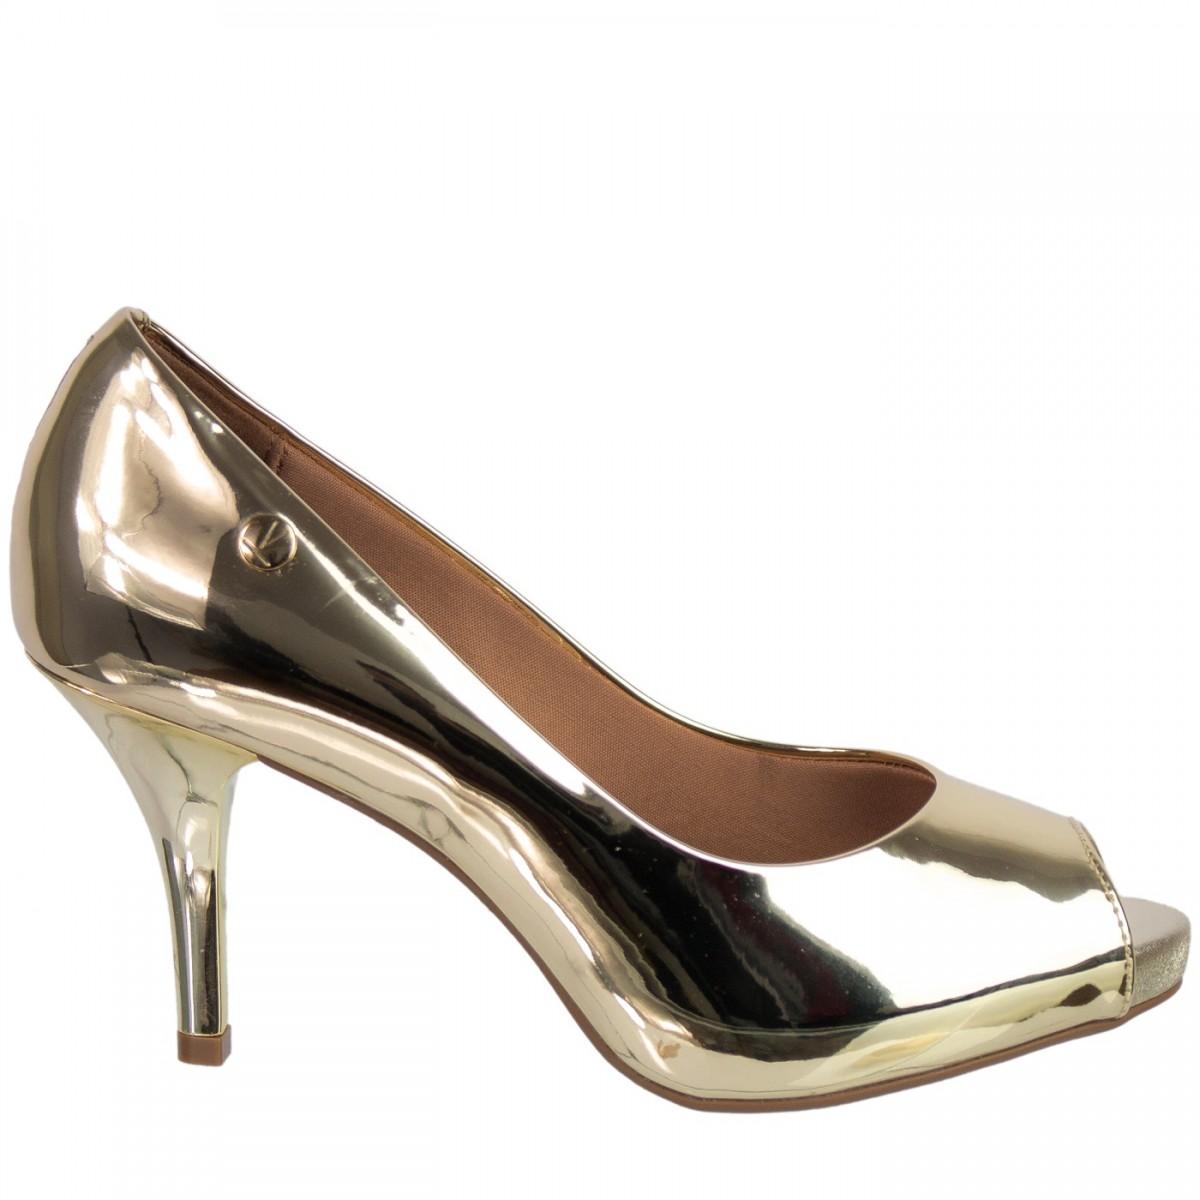 5409b19e8 Bizz Store - Sapato Peep Toe Metalizado Vizzano Metal Glamour